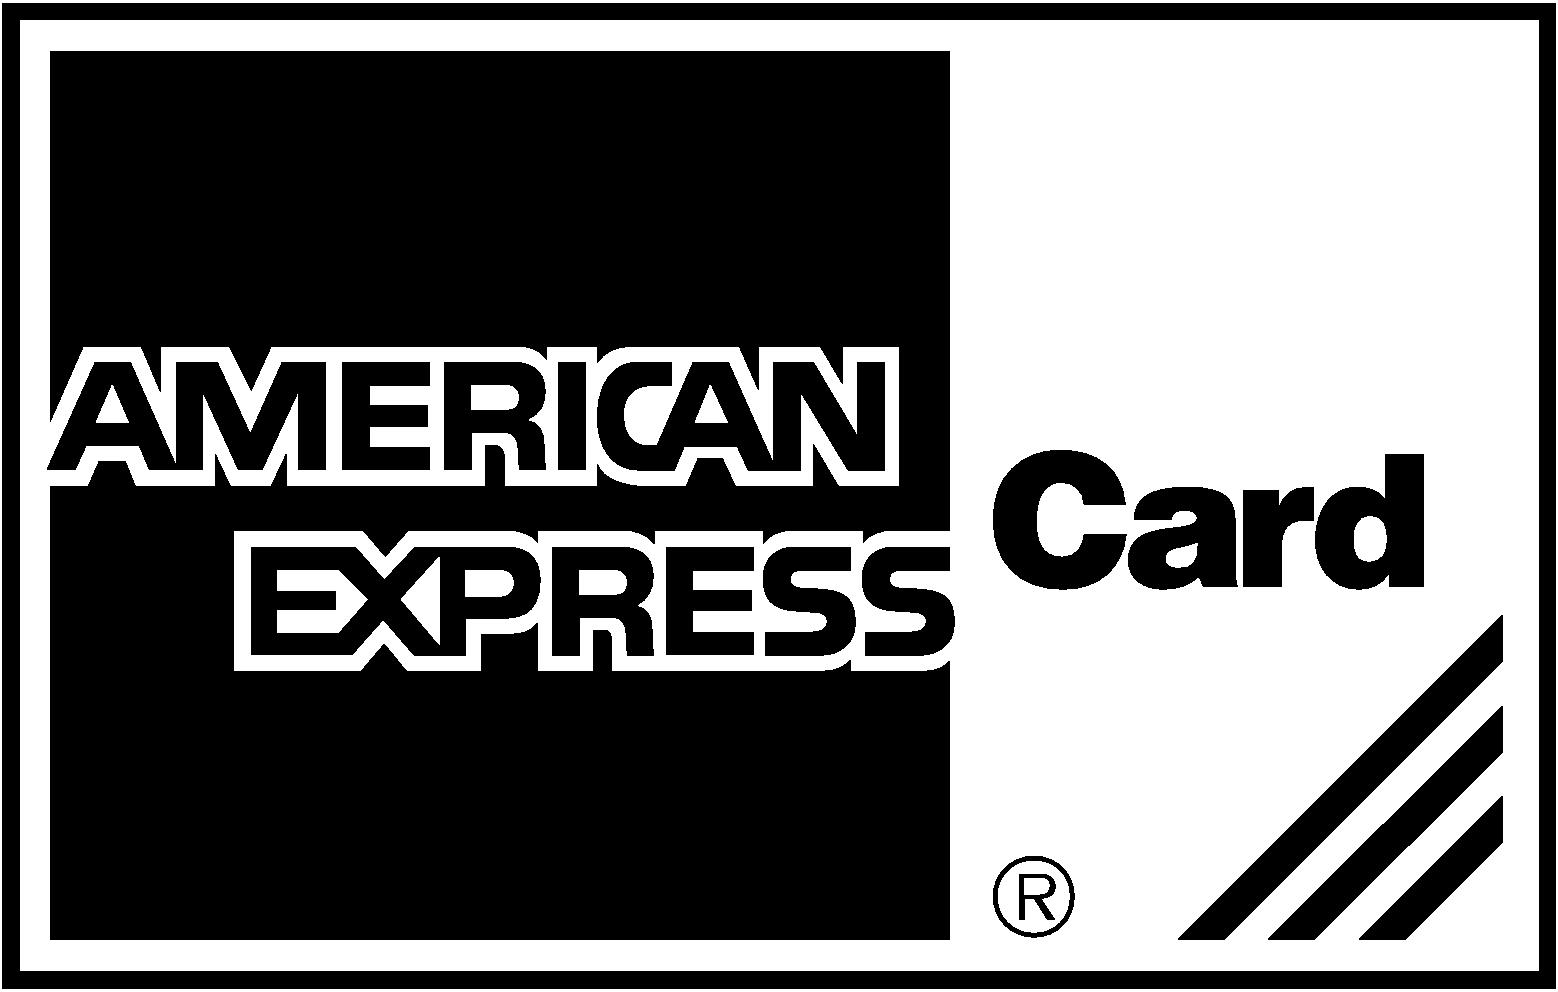 American express logo black white american express